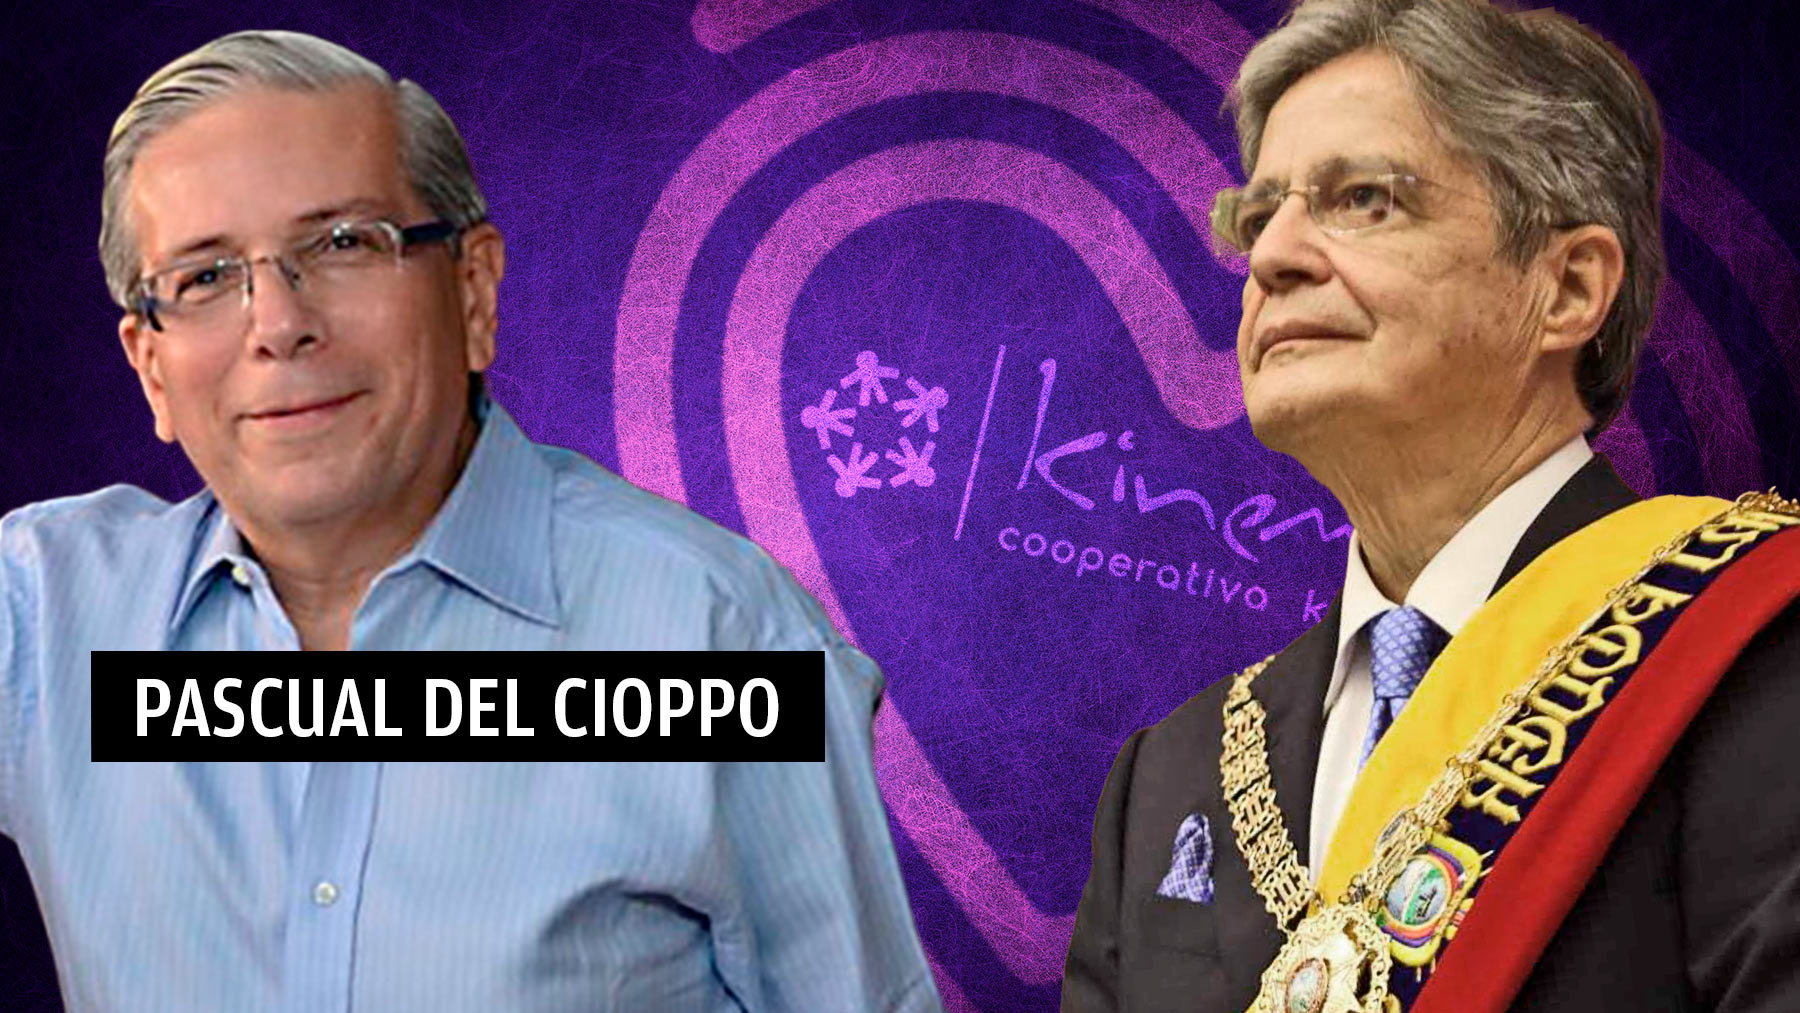 Guillermo Lasso, presidente de Ecuador, junto con Pascual del Cioppo, embajador de Ecuador en España.